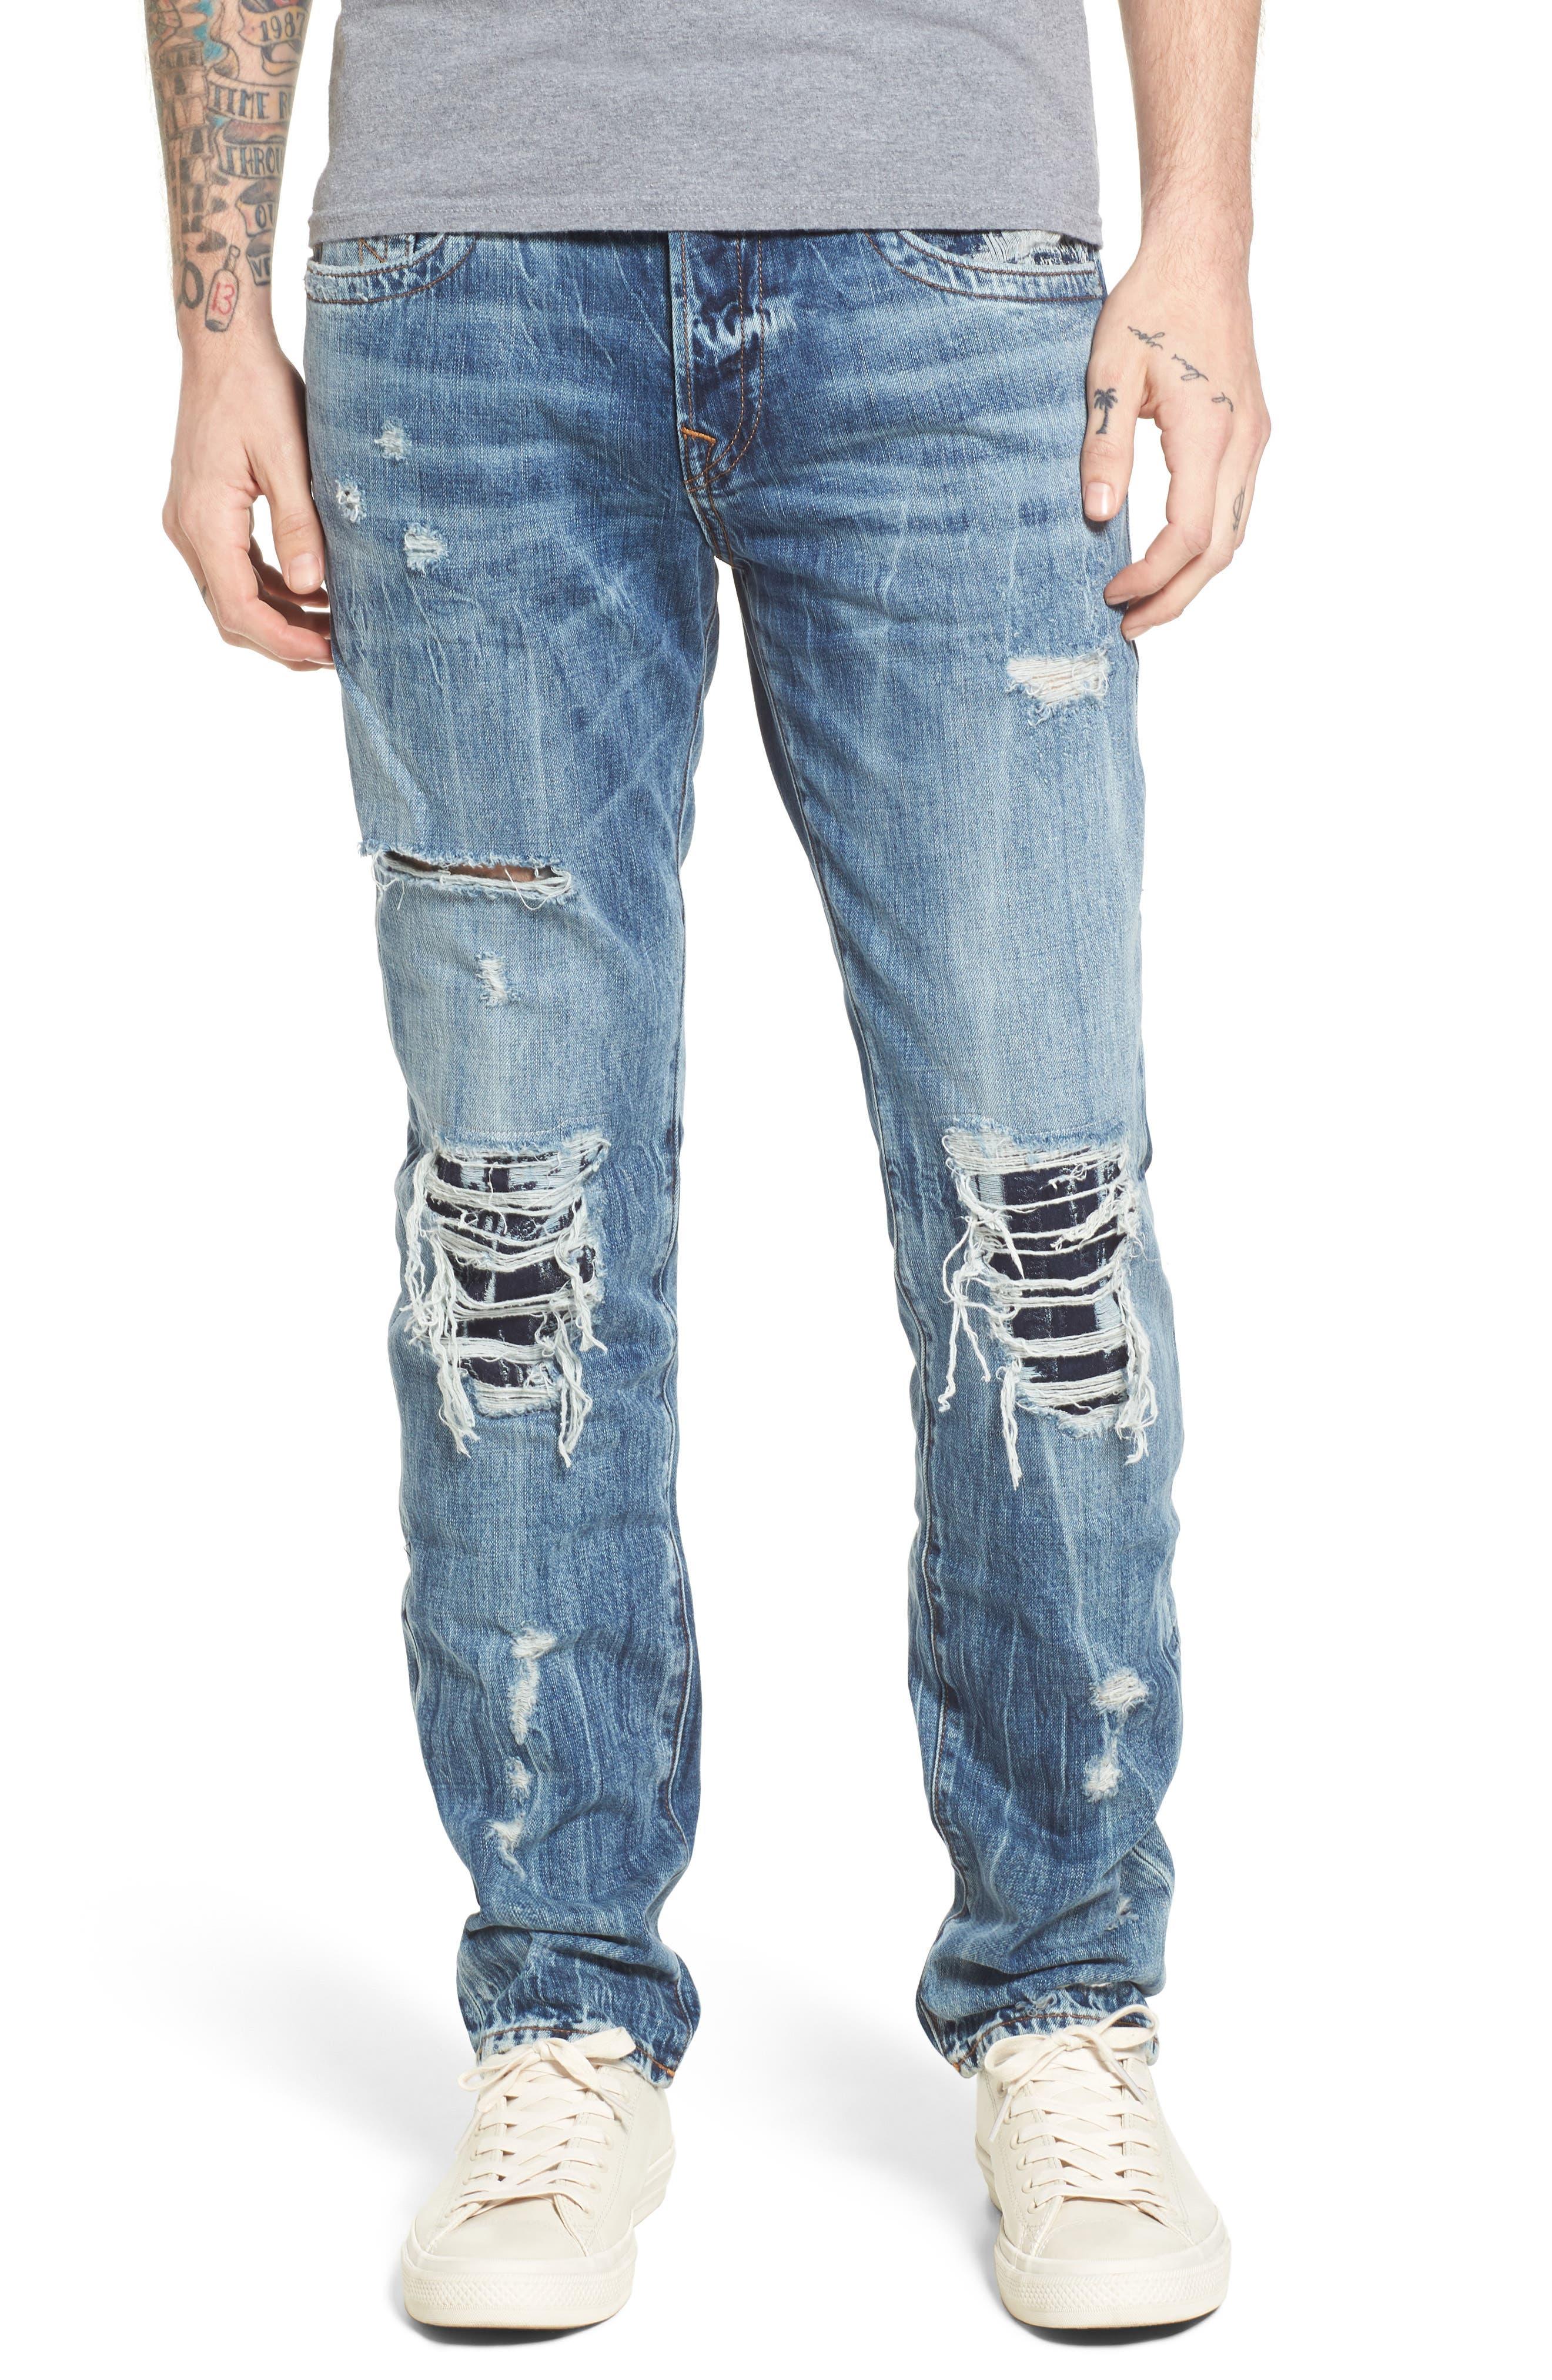 Main Image - True Religion Brand Jeans Rocco Skinny Fit Jeans (Indigo Birch)